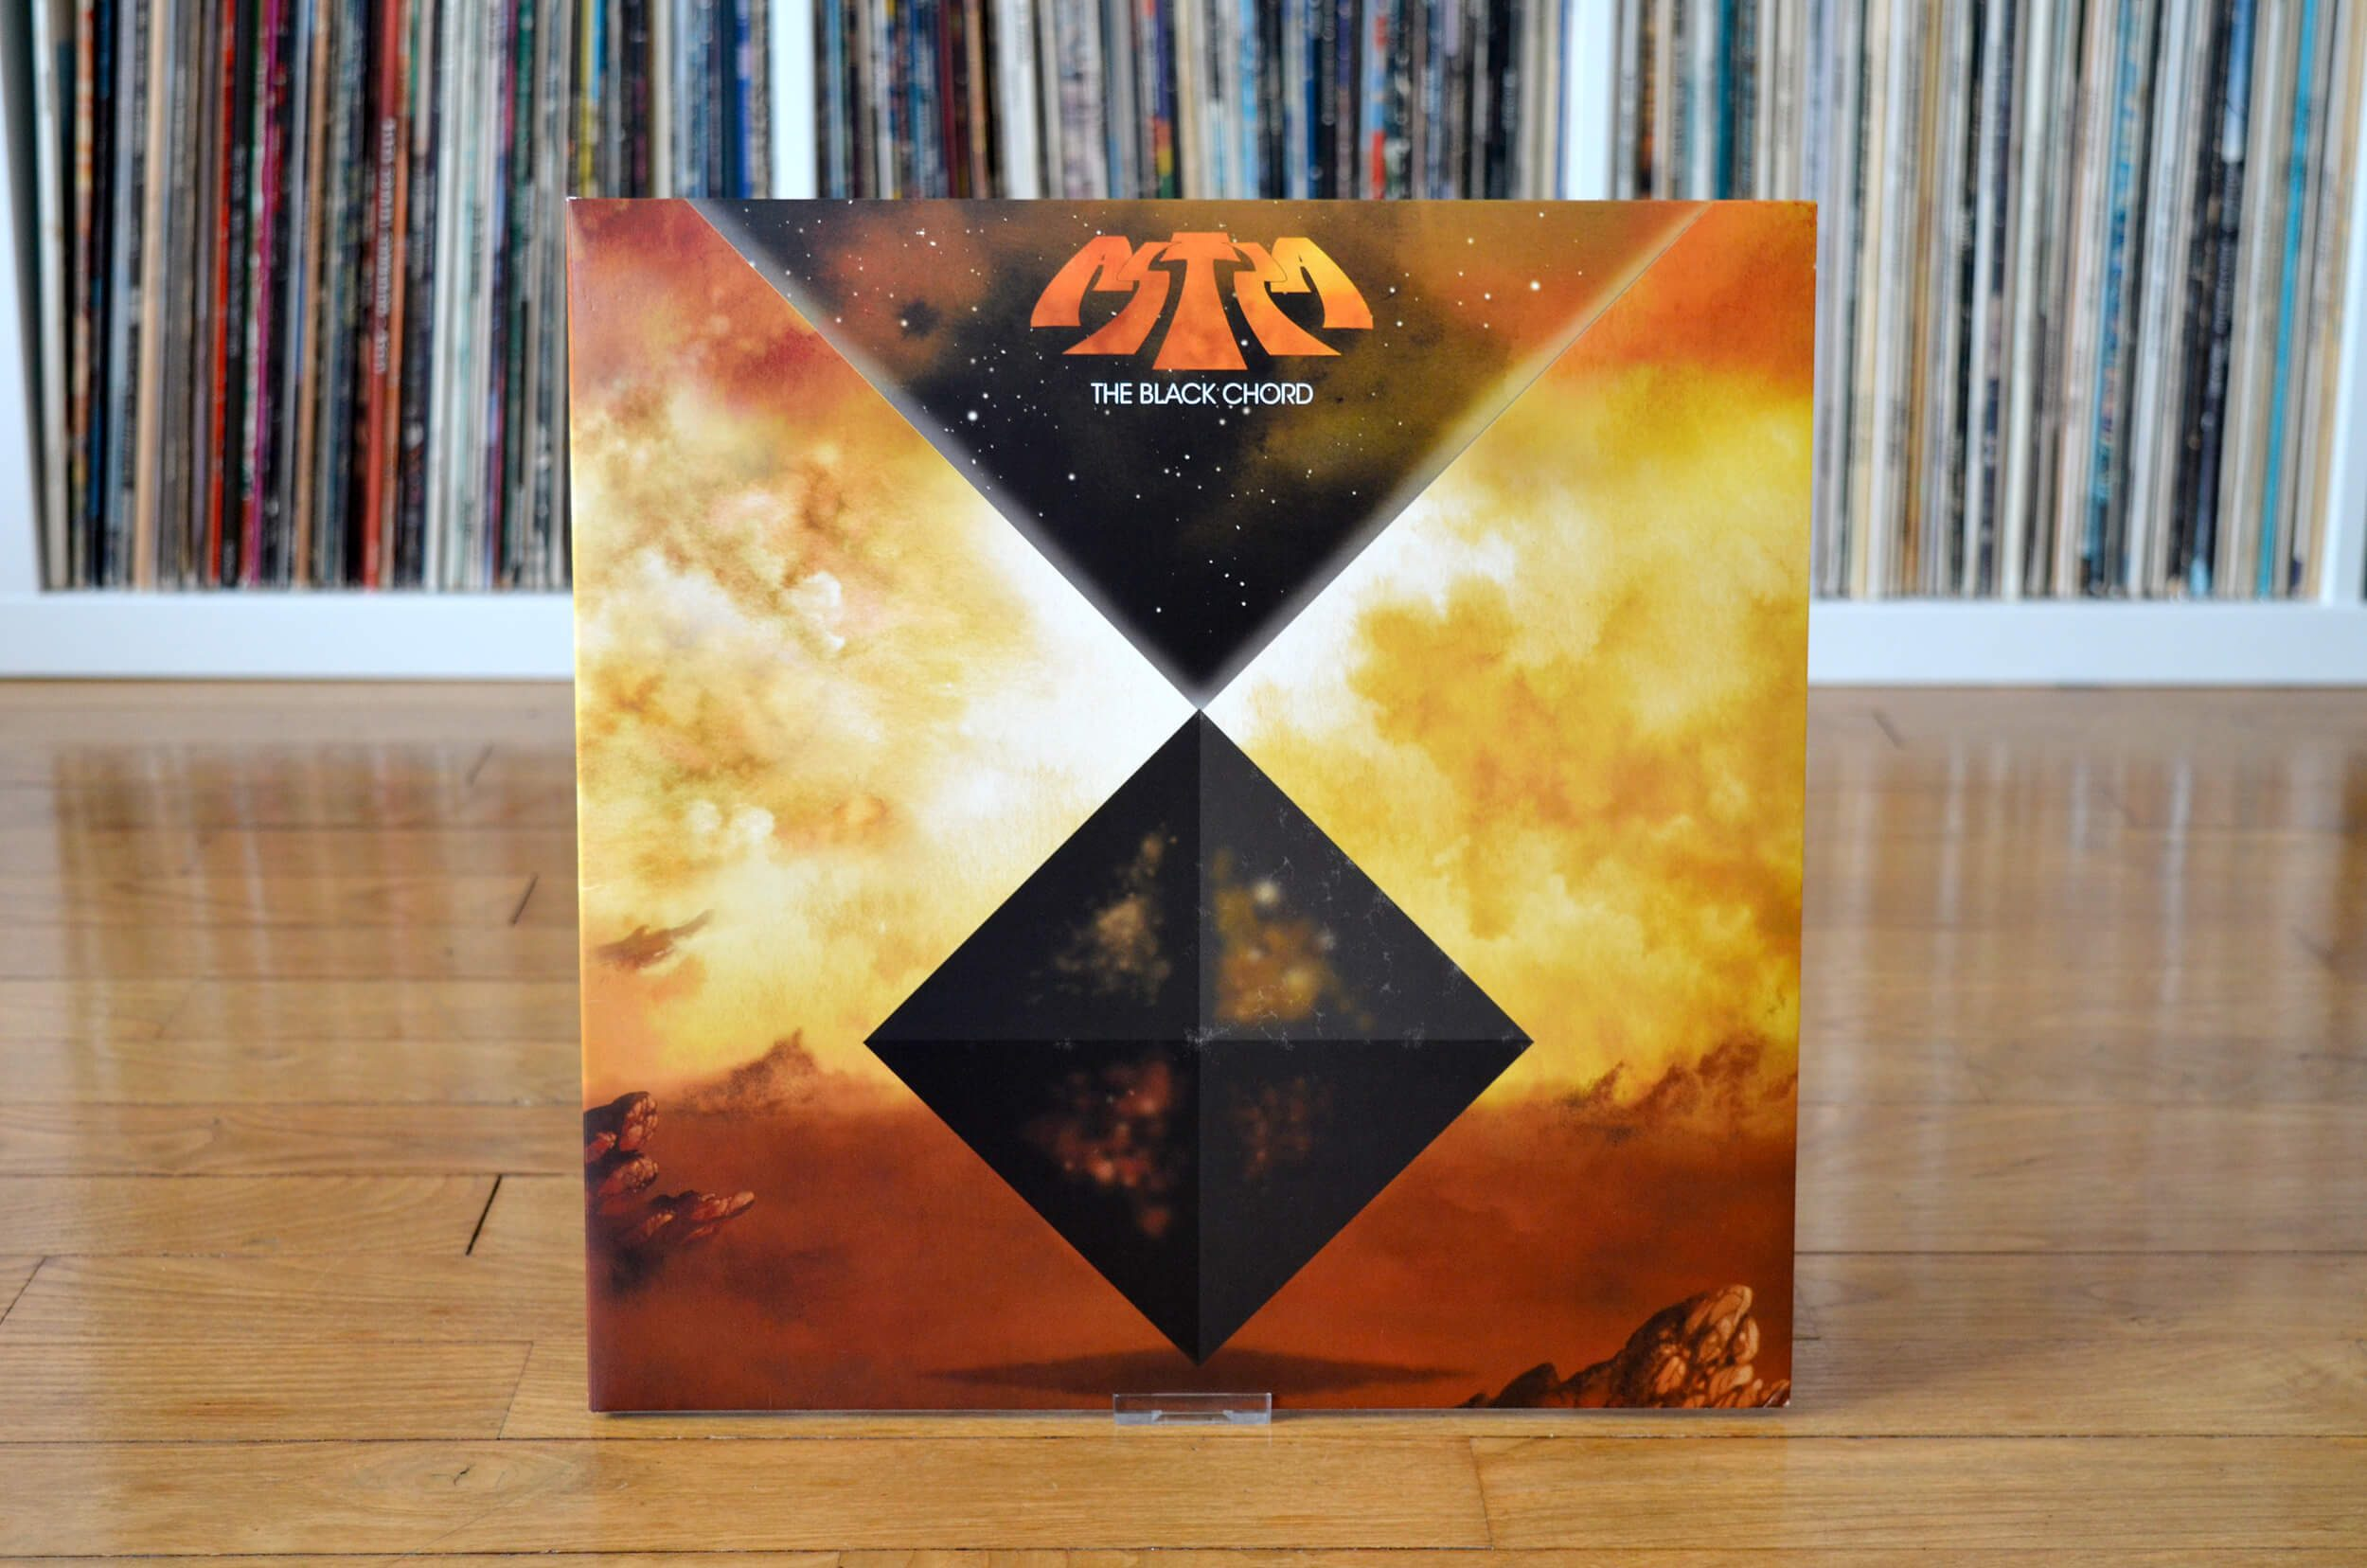 Astra - The Black Chord